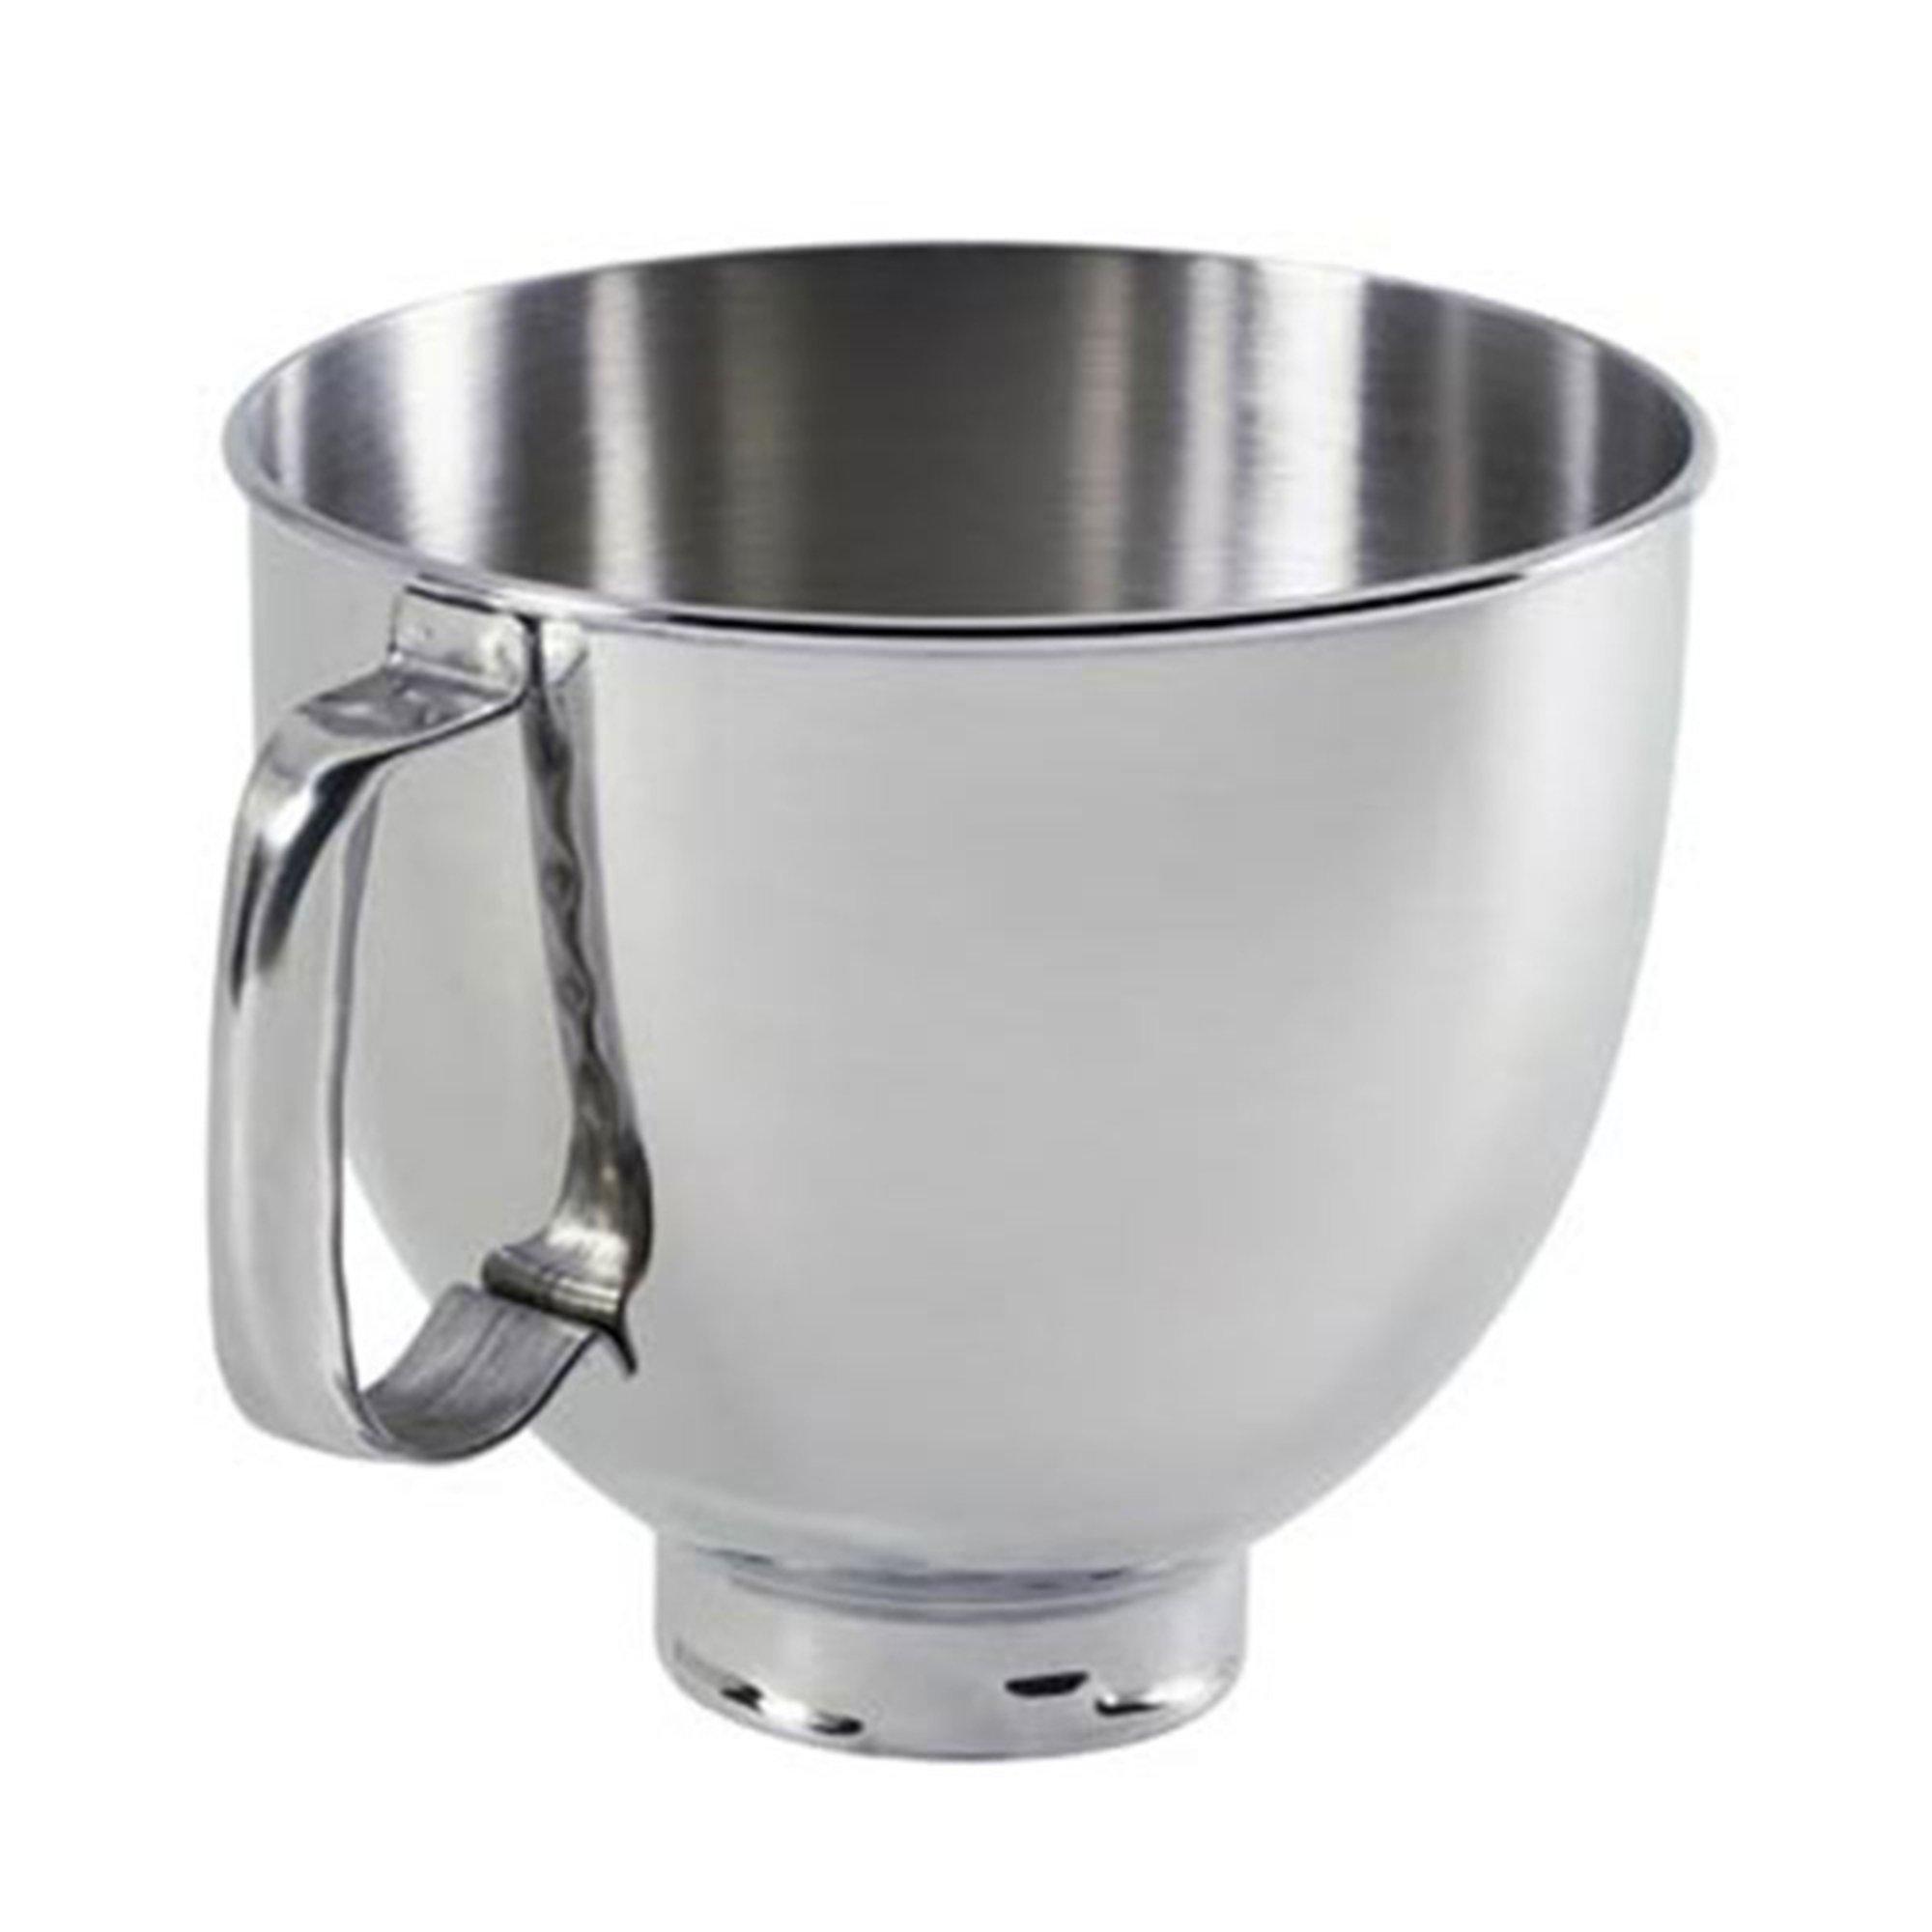 Kitchenaid 5 Quart Polished Stainless Steel Bowl W